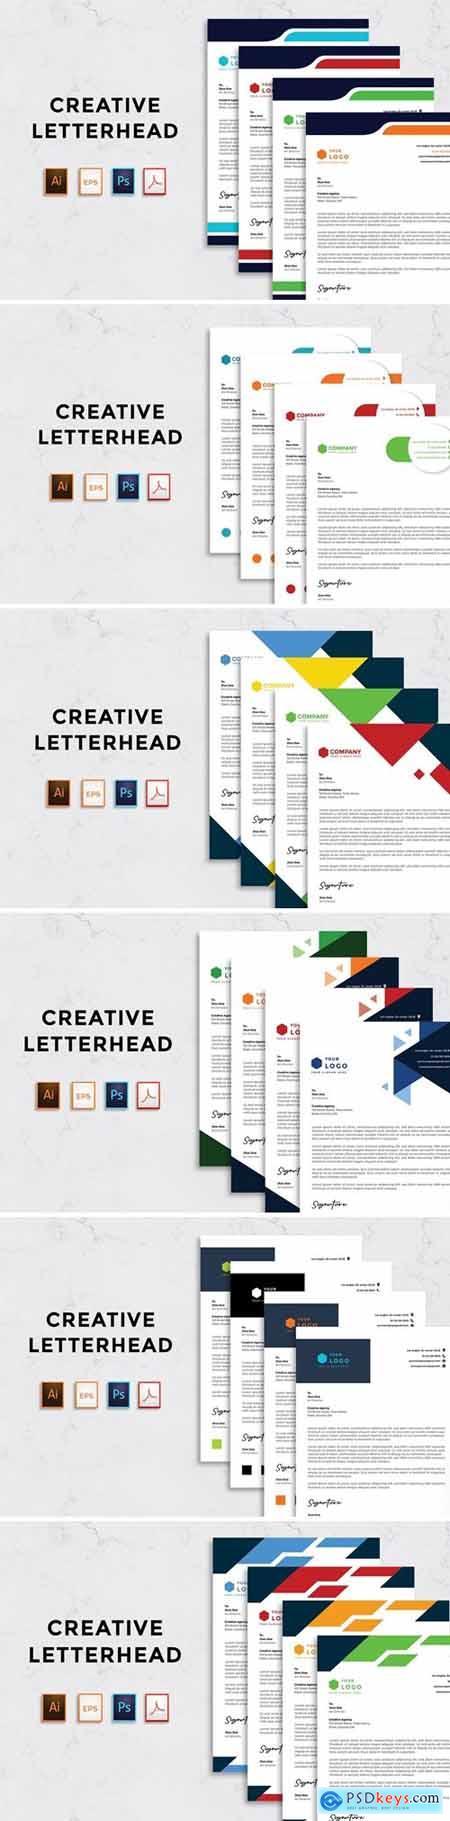 Creative Letterhead Bundle